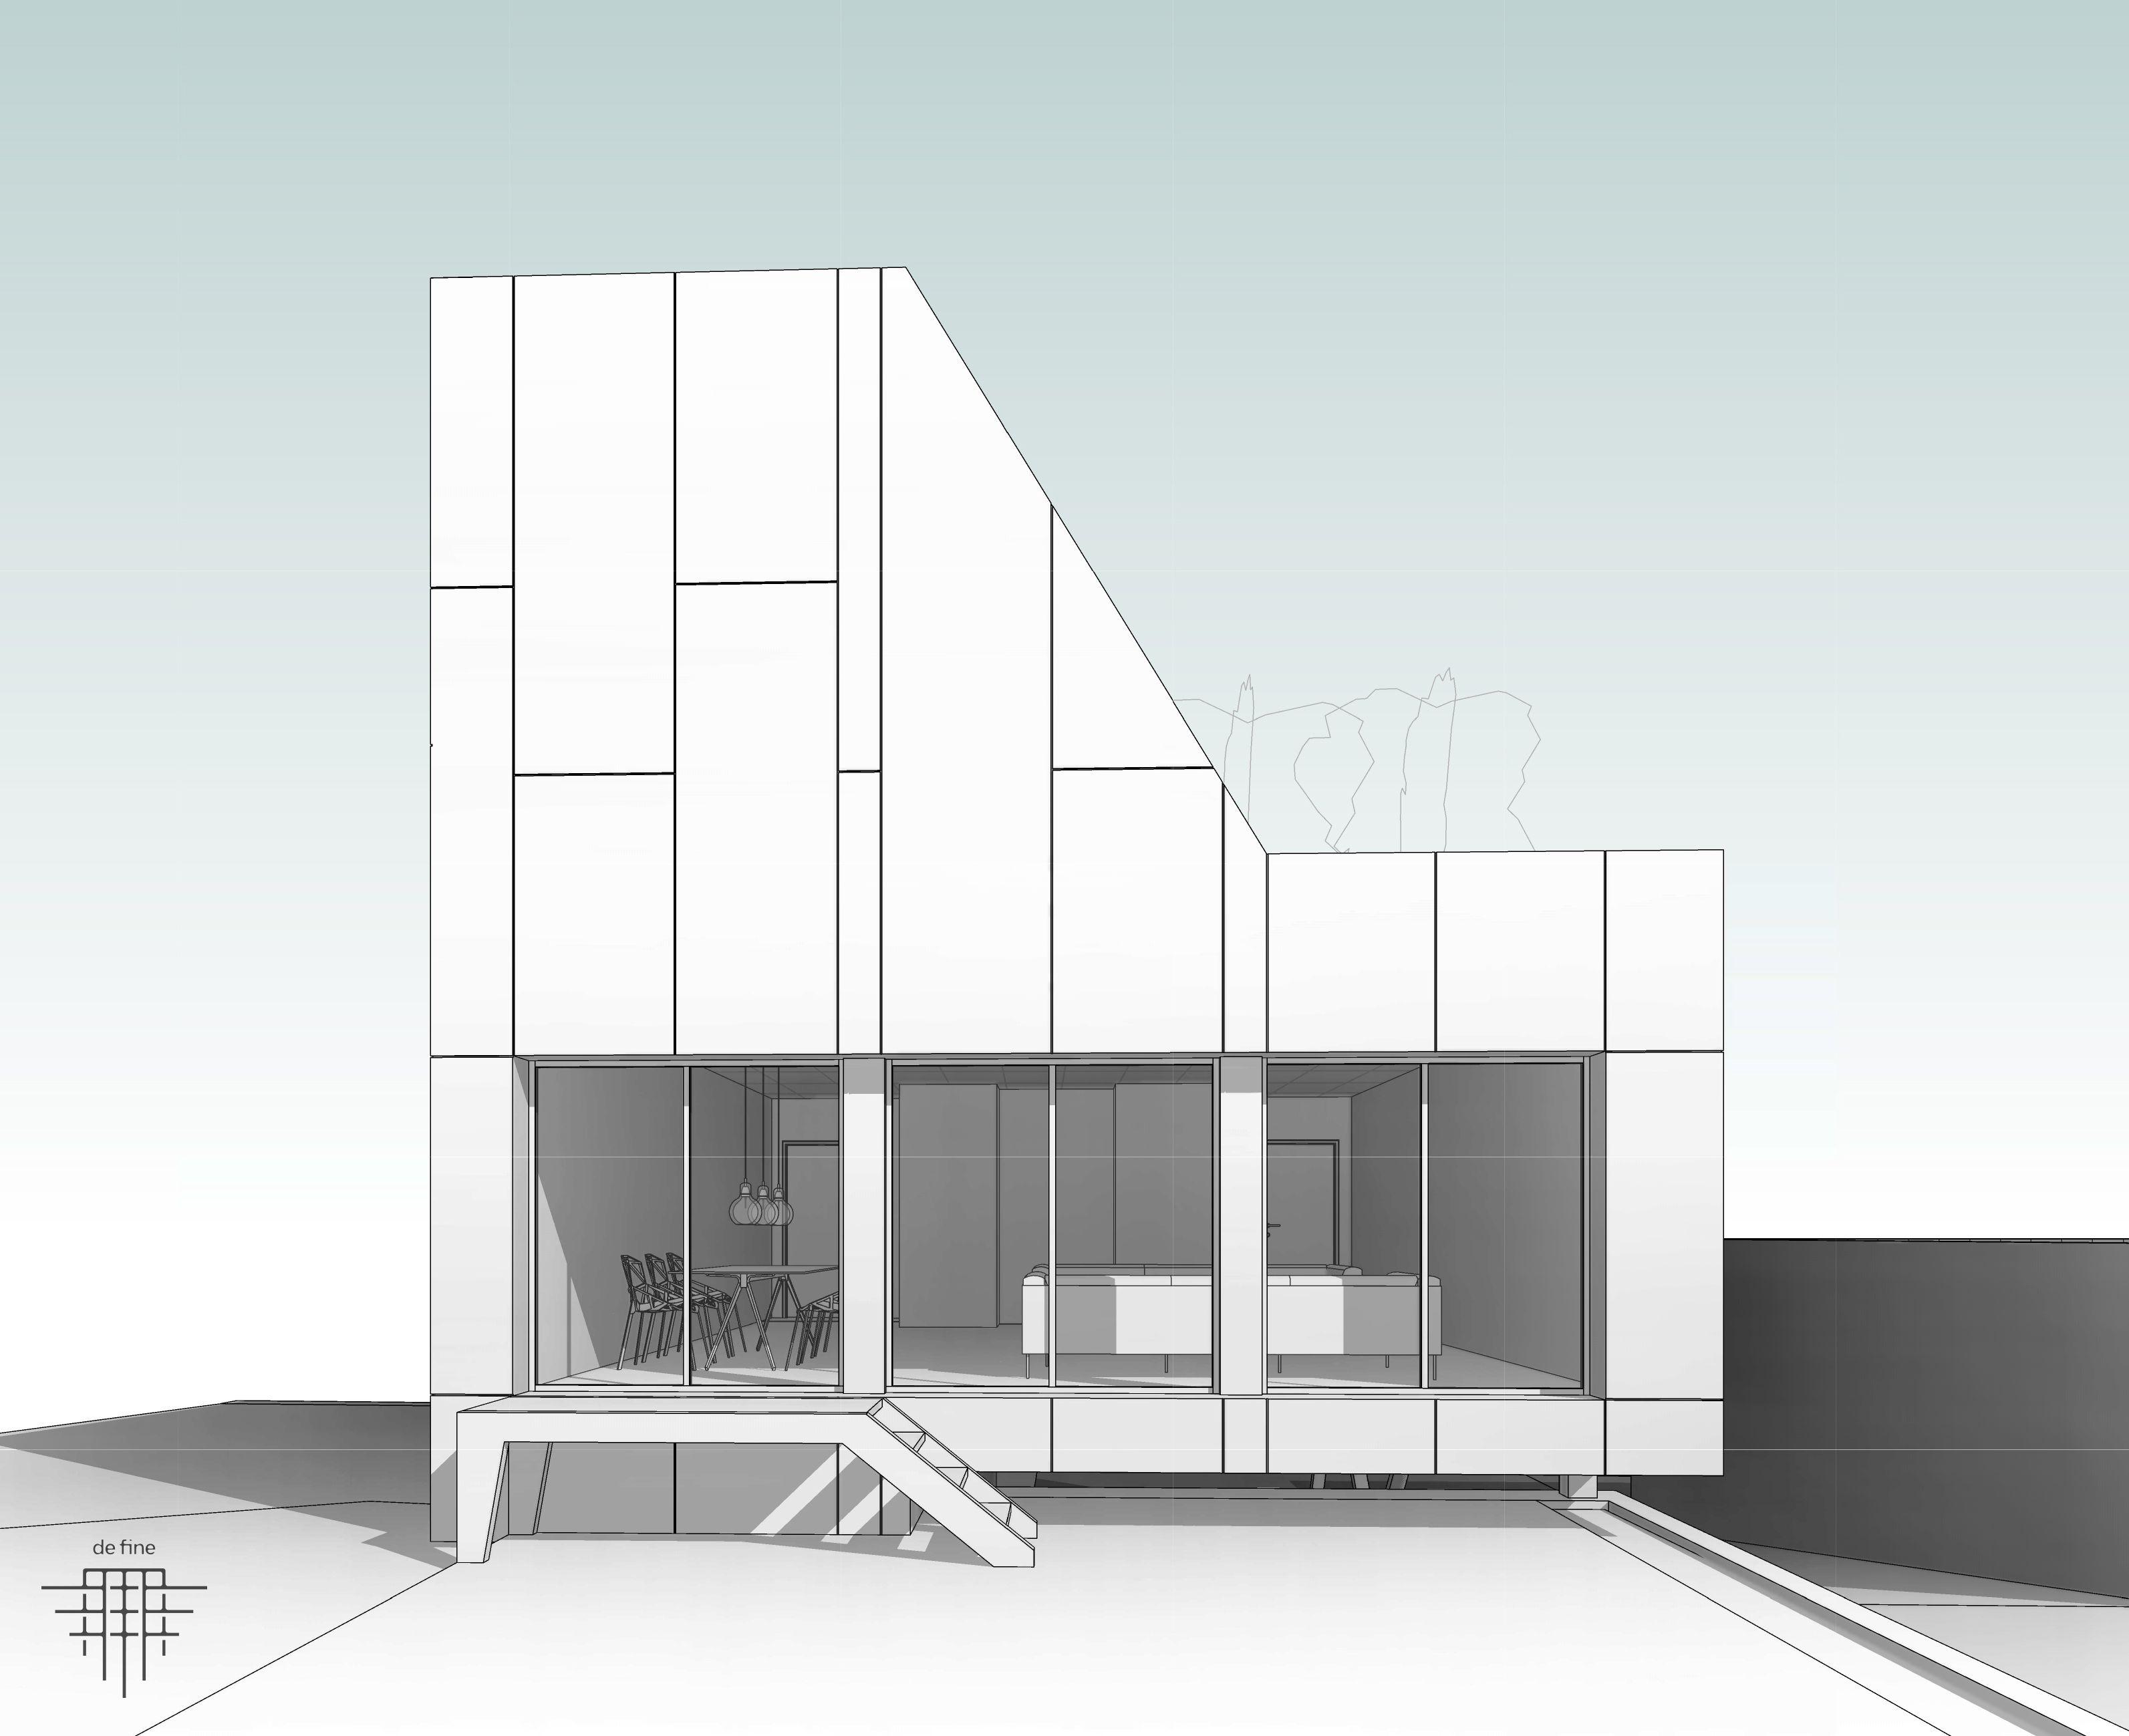 Pin By Dashnor Kadiri On Revit Architecture Revit Architecture Architecture Model Home Decor